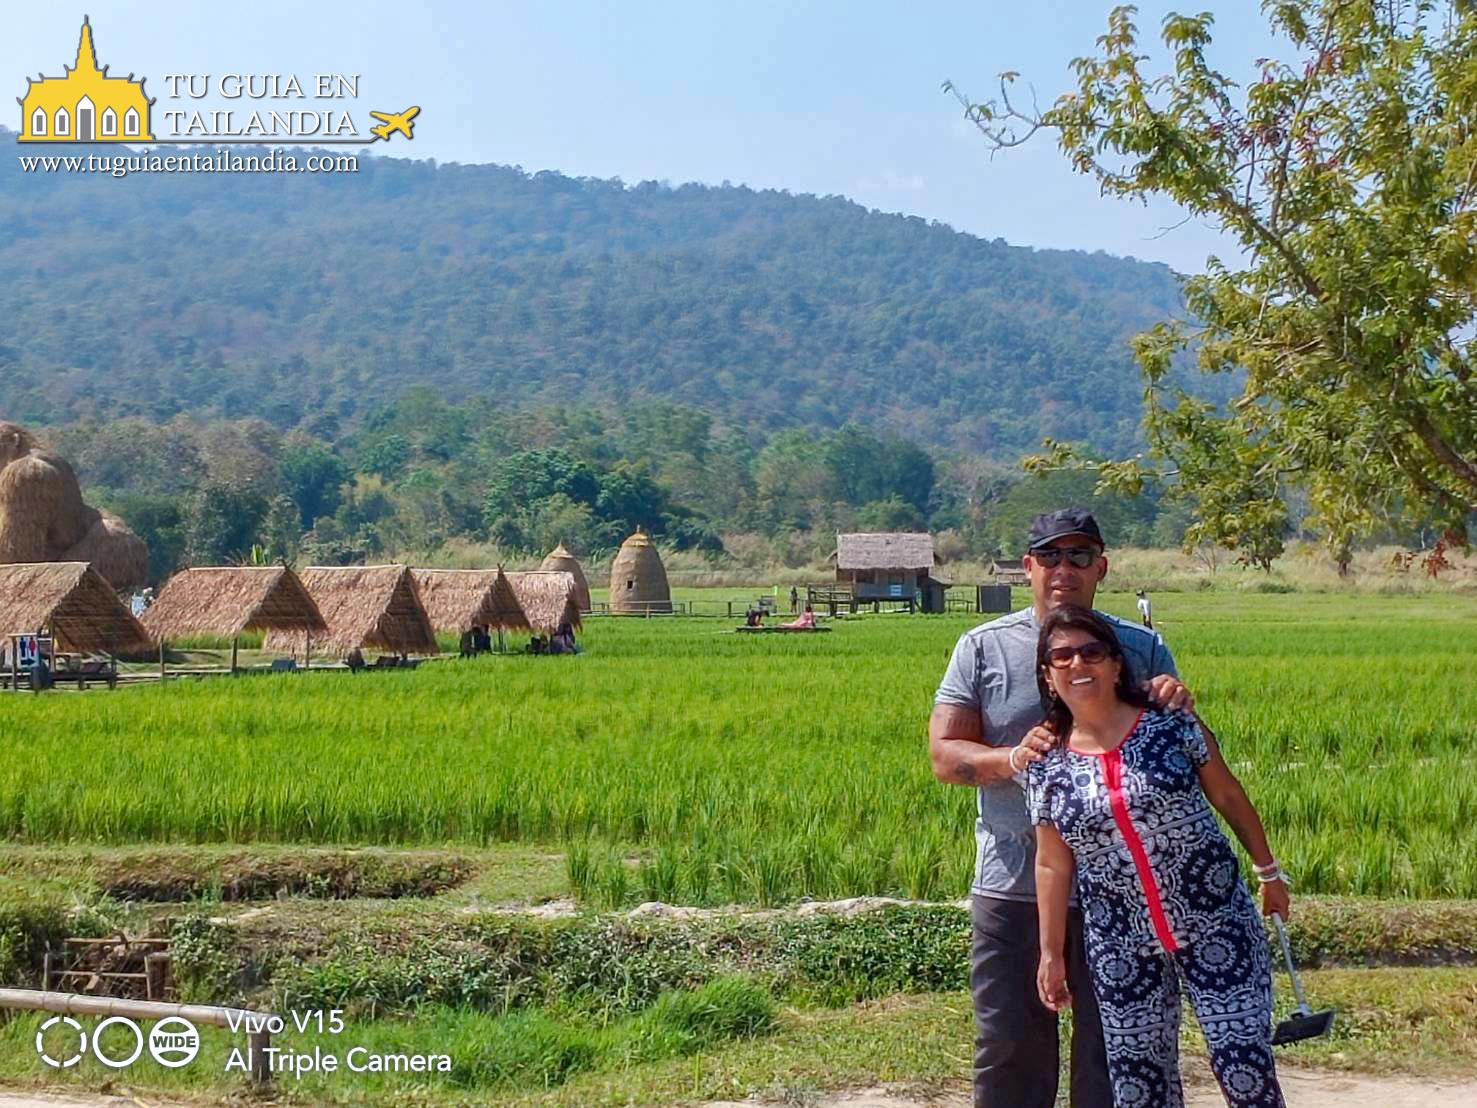 campos de arroz en chiang mai